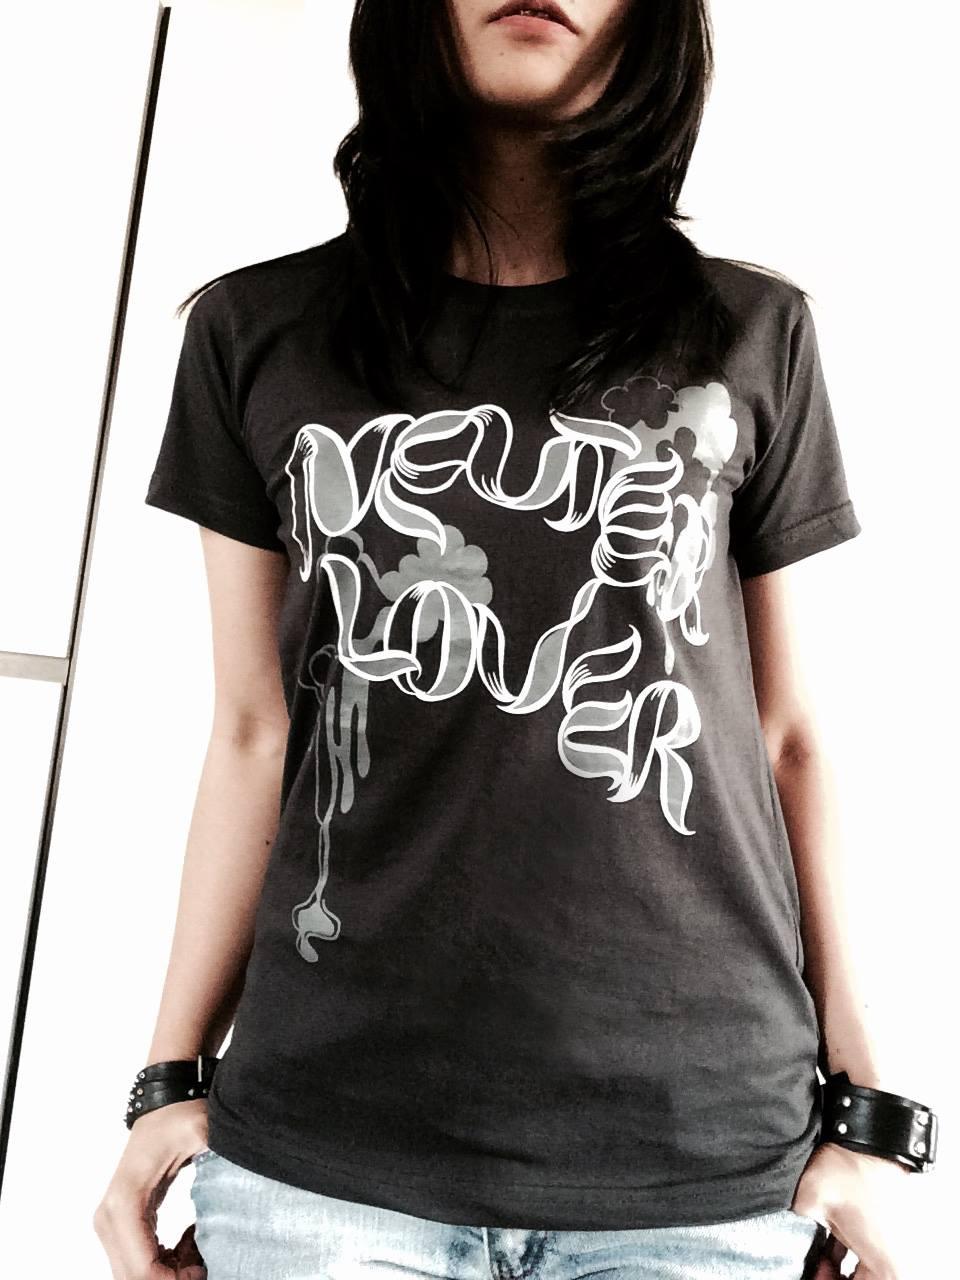 neuter-lover-1